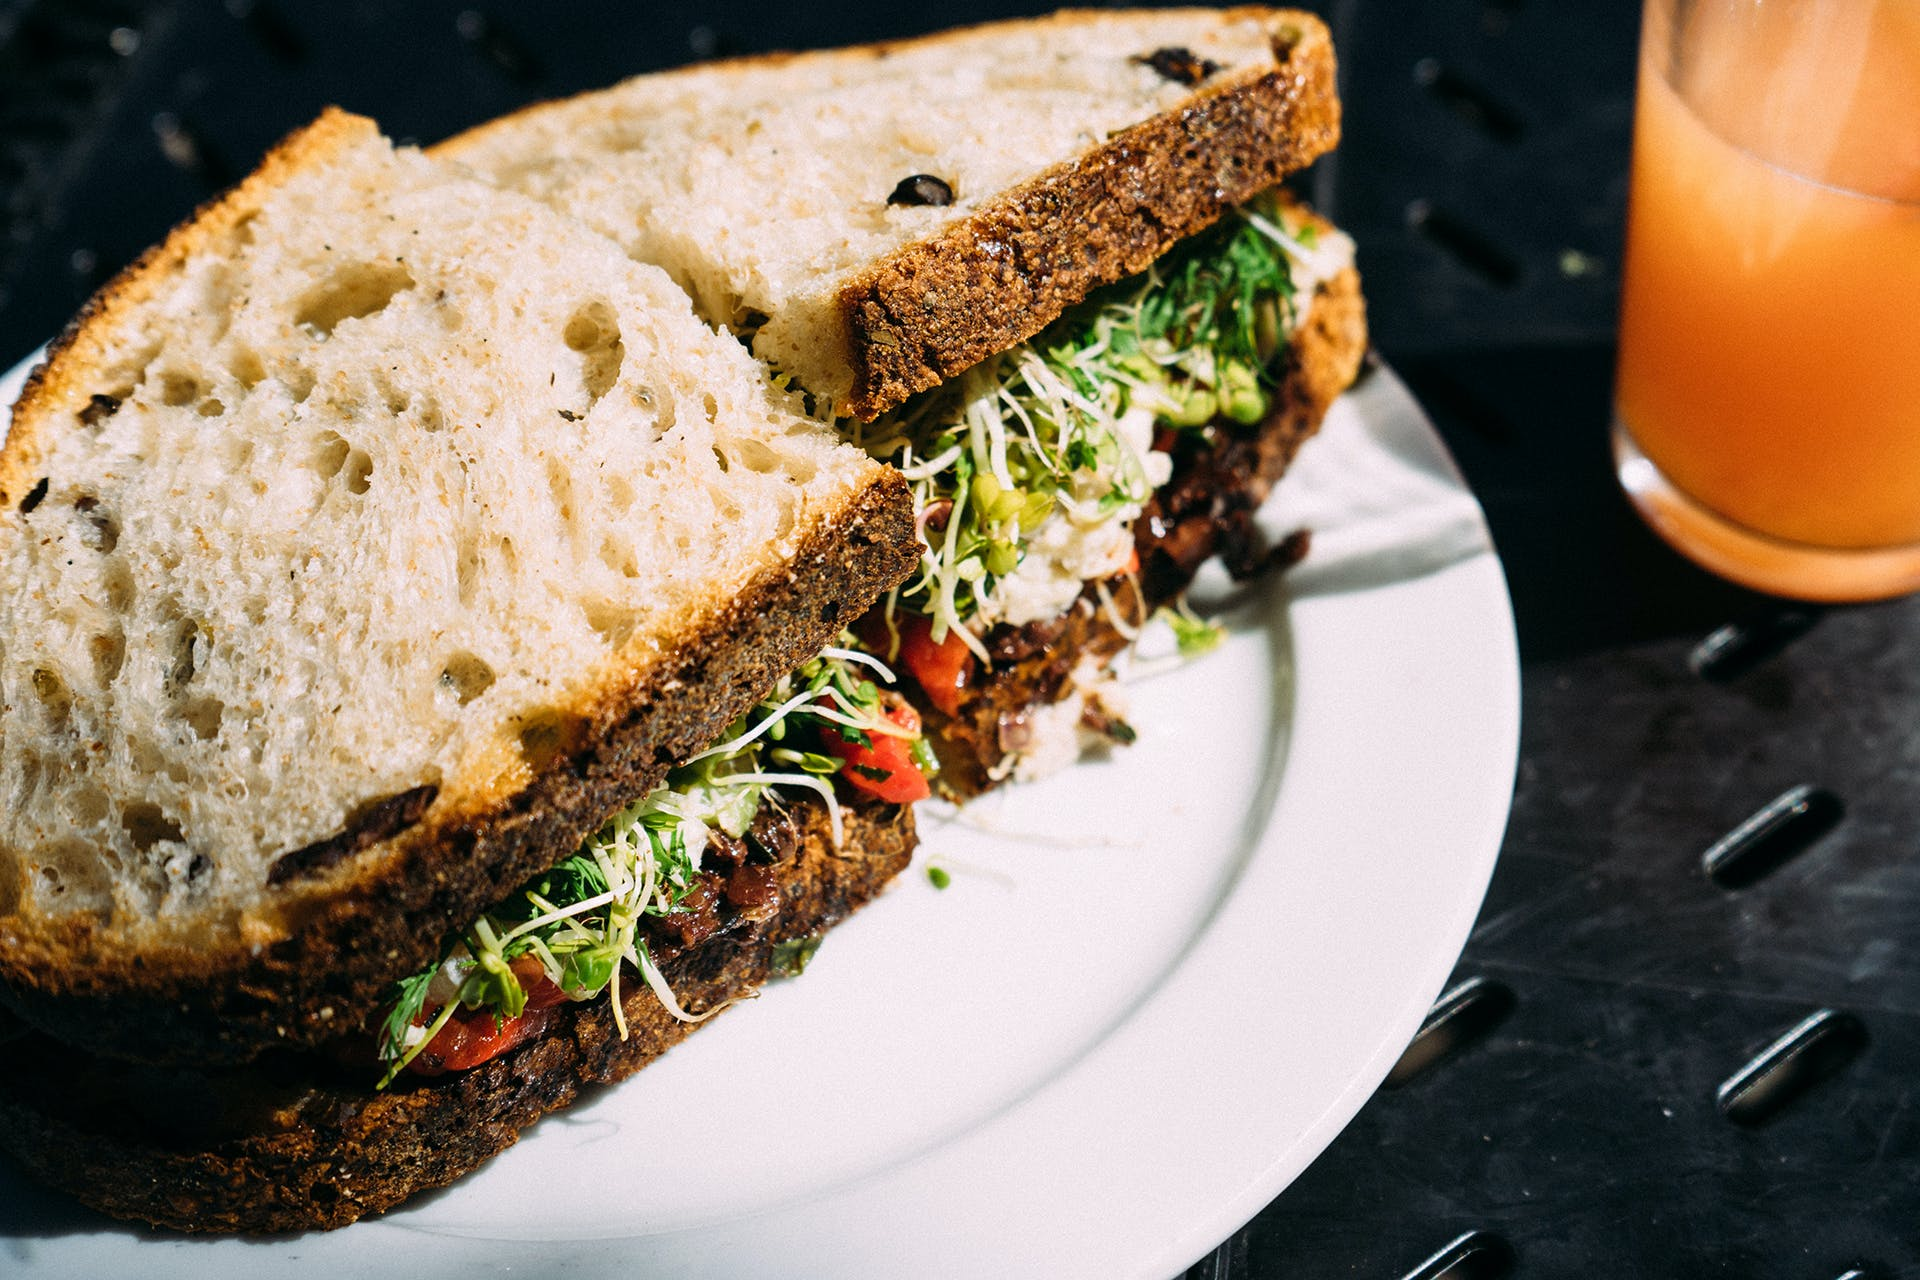 Vegetable Sandwich on Ceramic Plate Near Drinking Glass